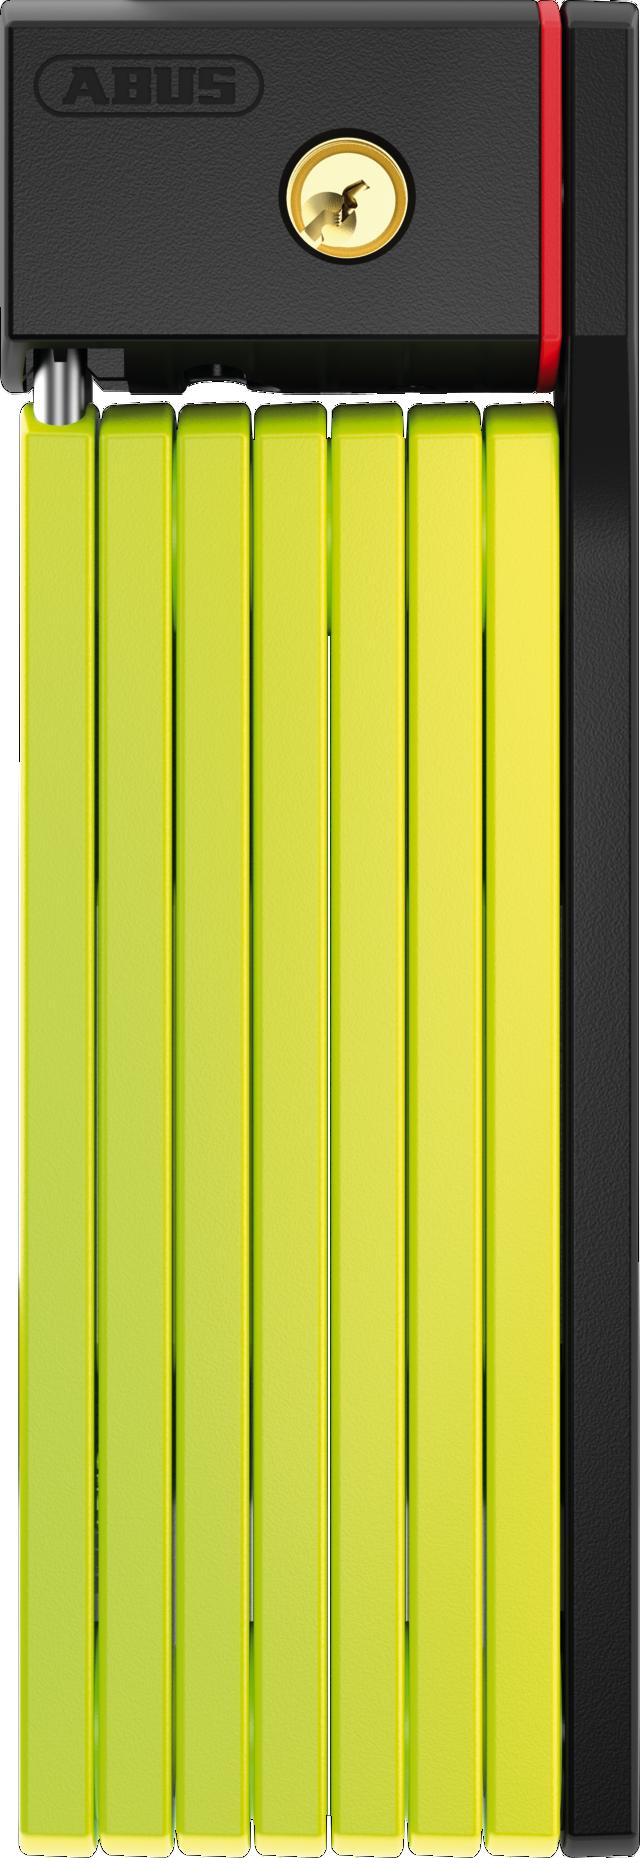 Faltschloss 5700/100 hellgrün SH